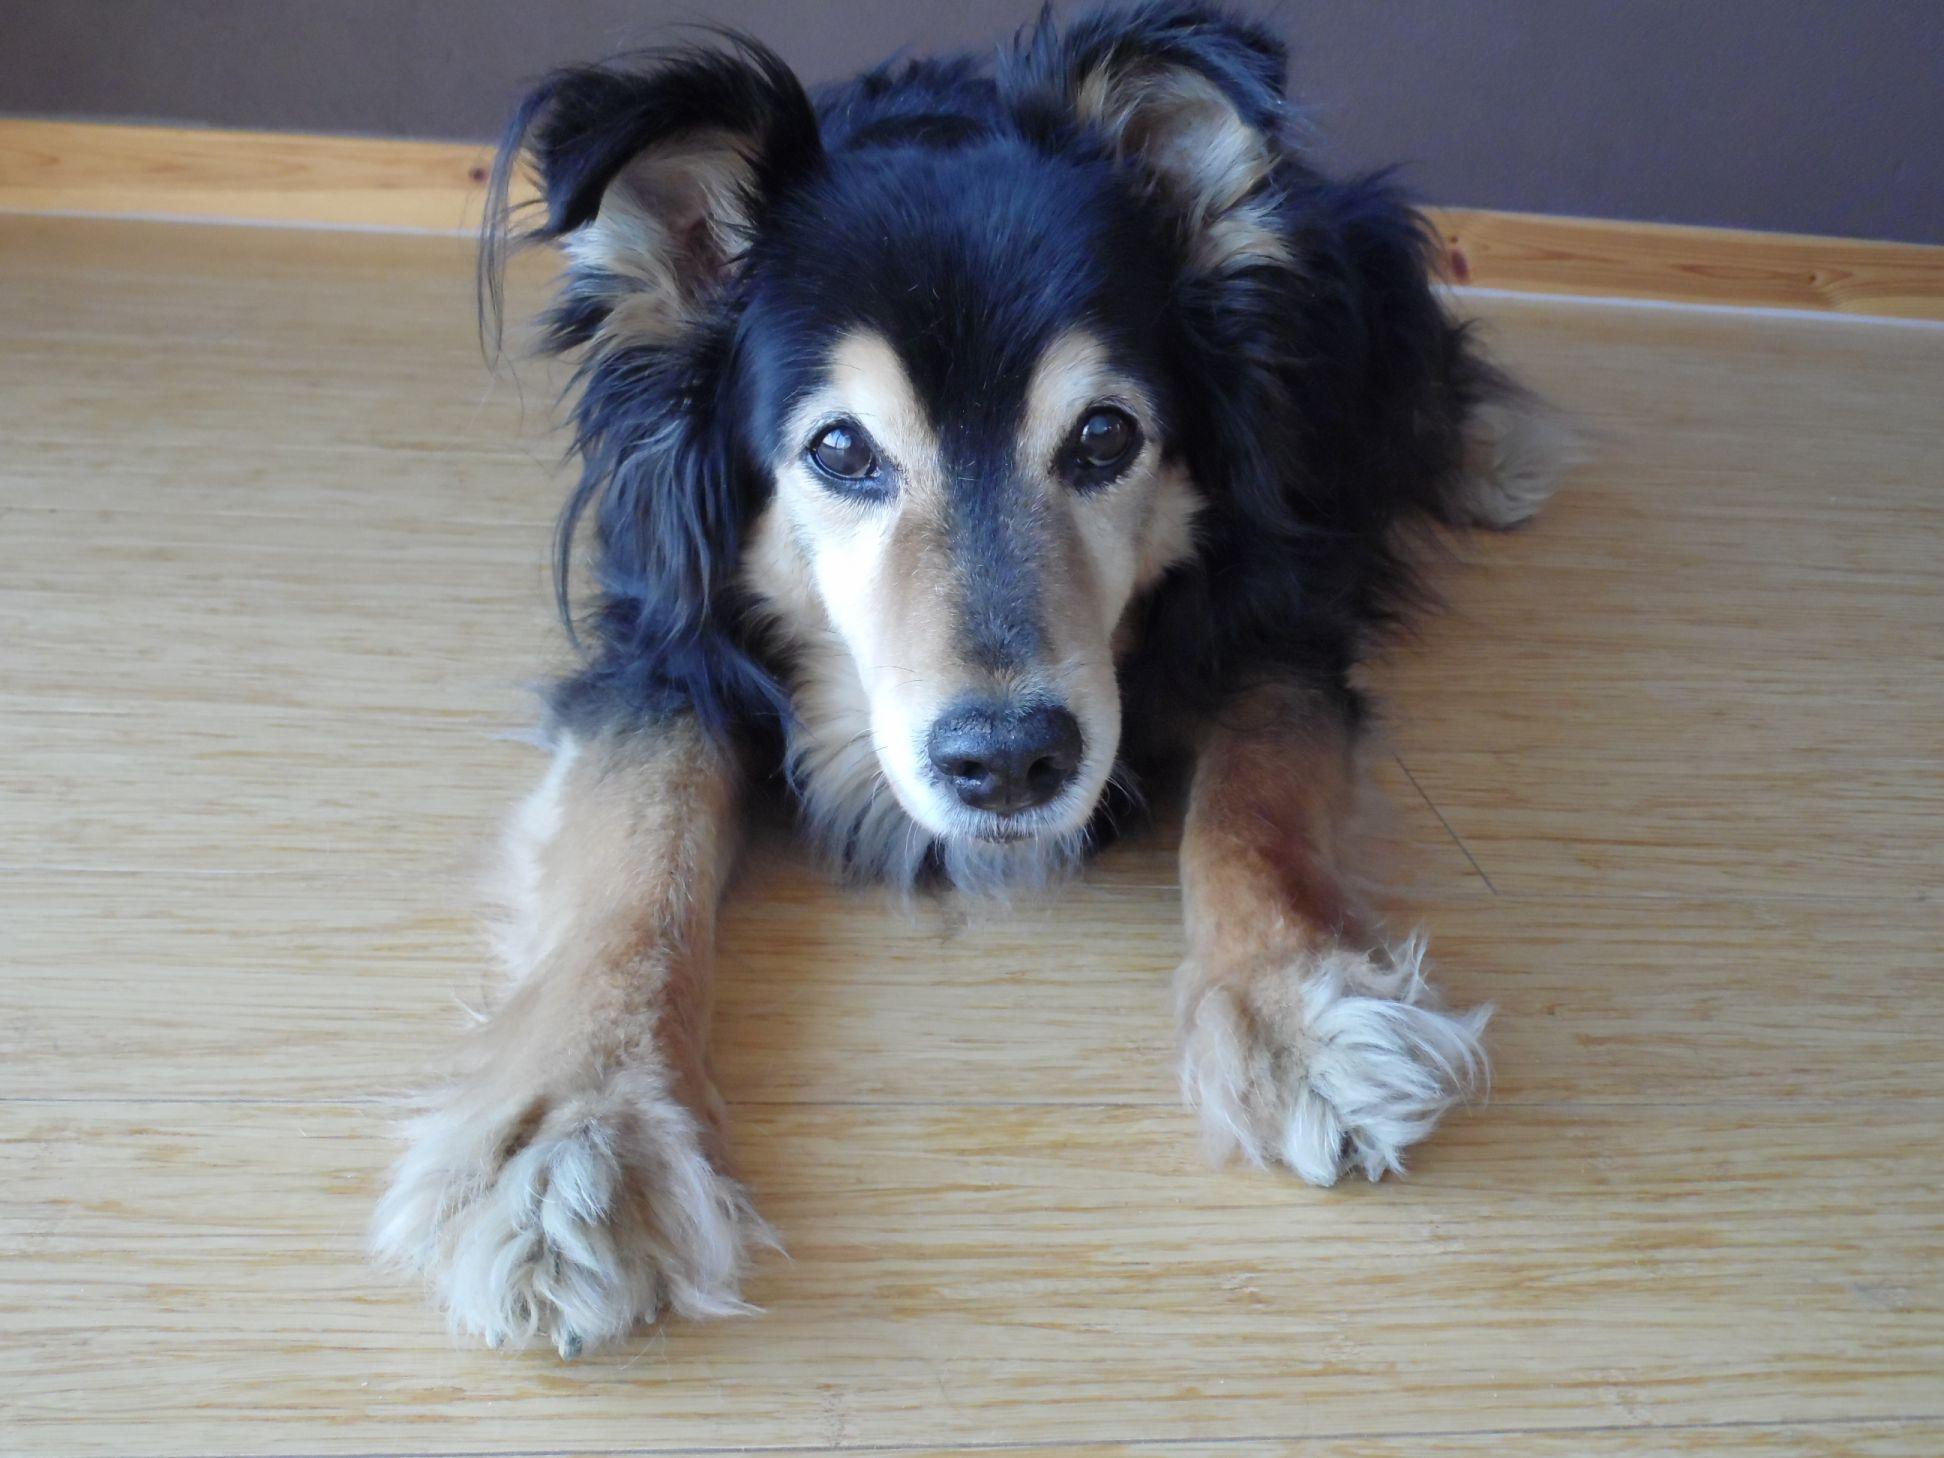 Photo of Gucio - doggy detective/taken by Marta Matyszczak